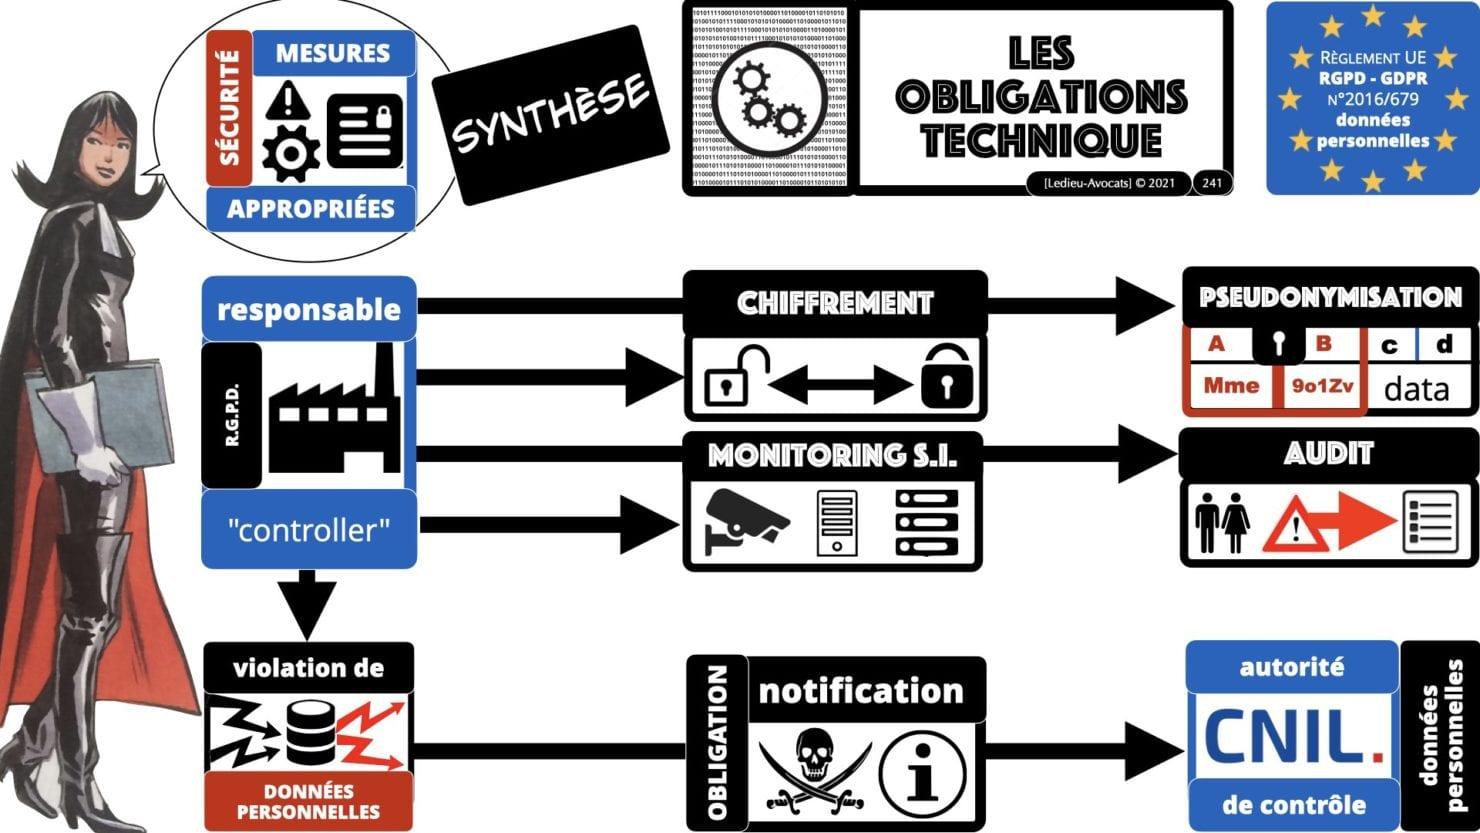 RGPD e-Privacy principes actualité jurisprudence ©Ledieu-Avocats 25-06-2021.241